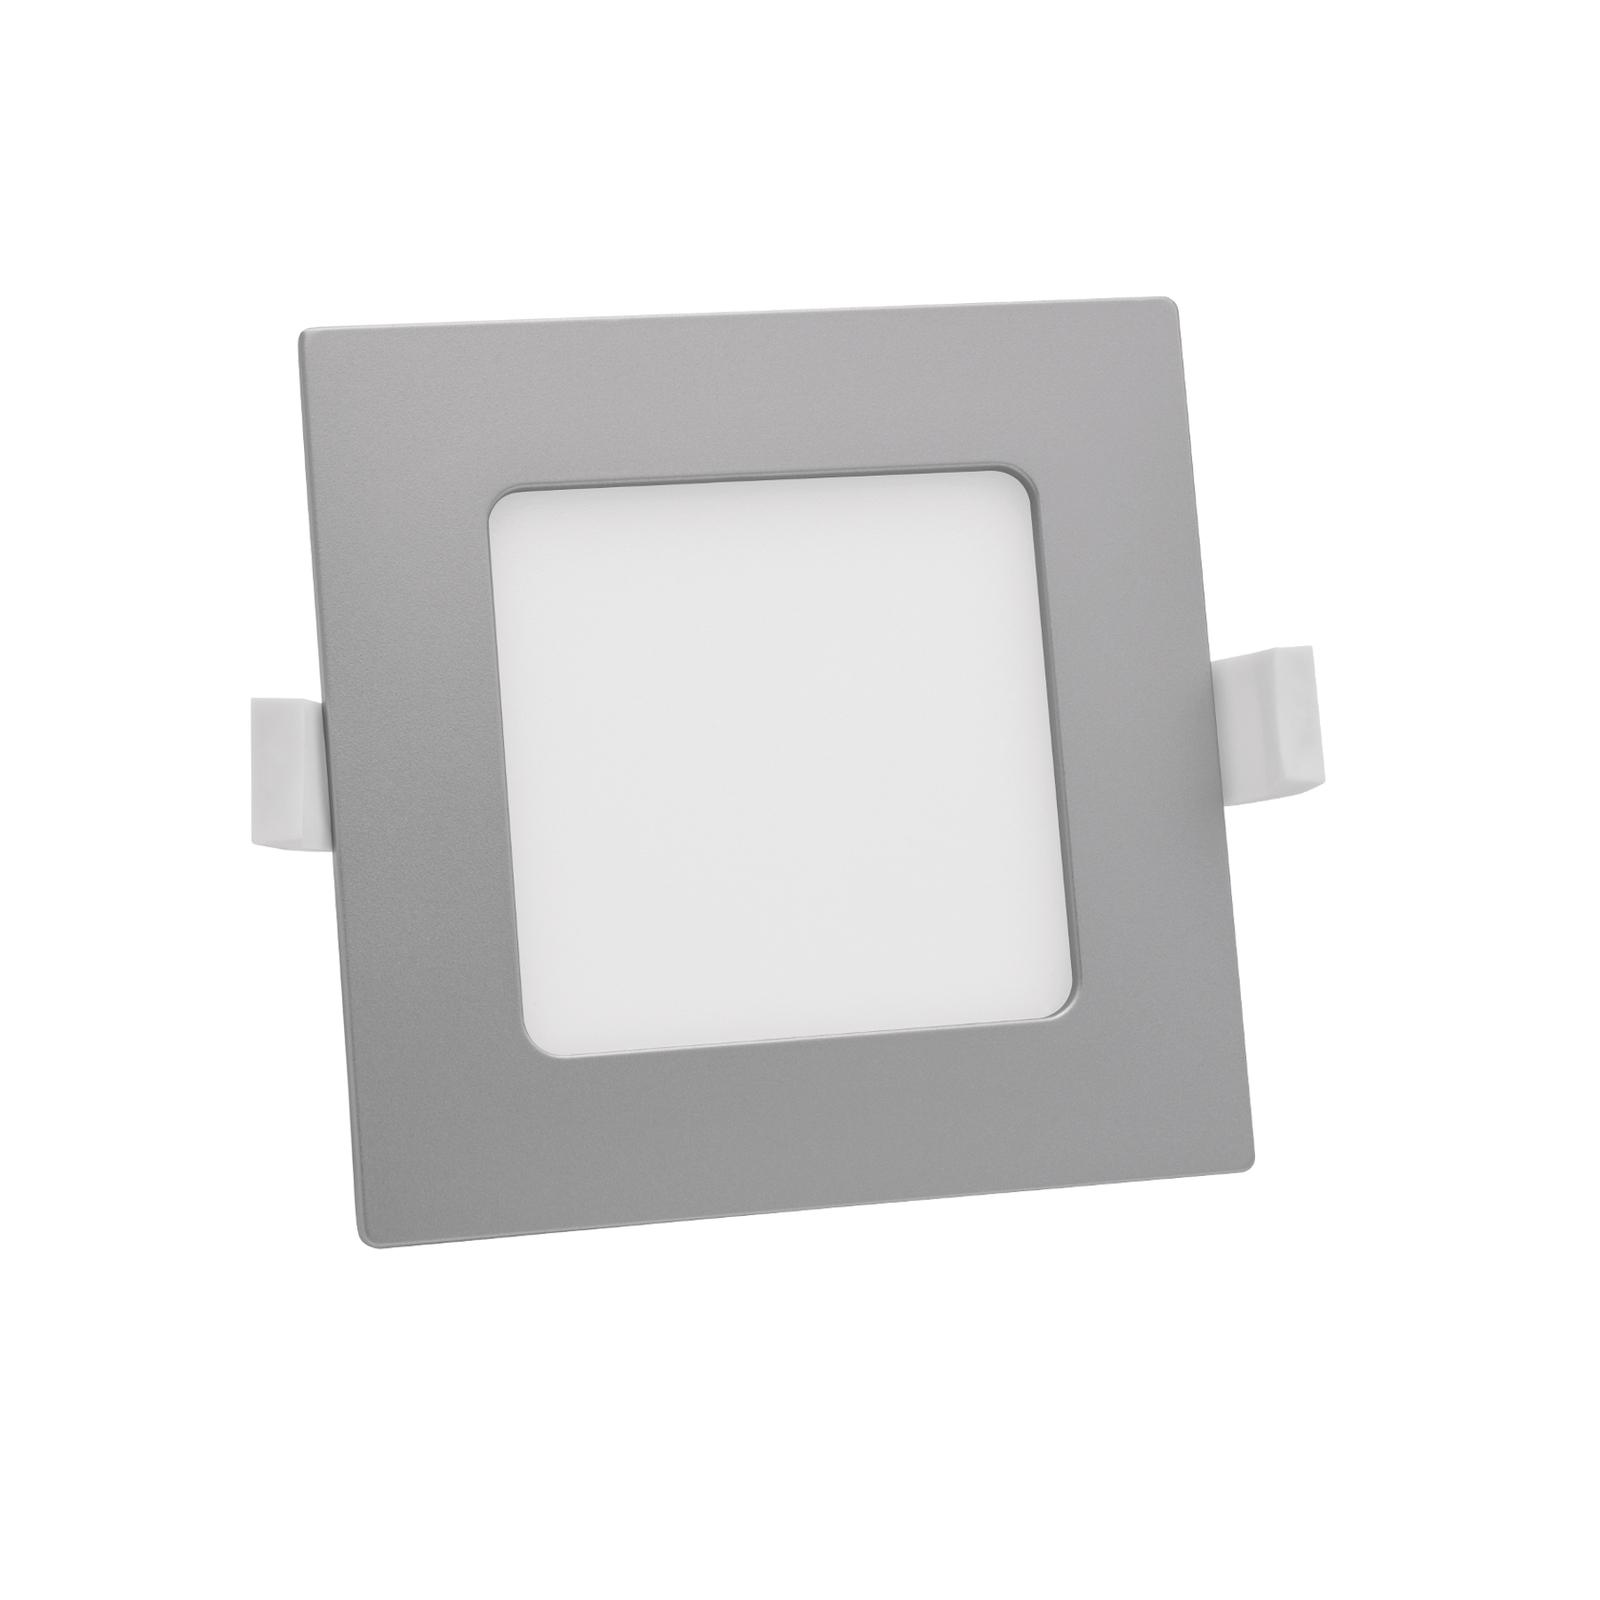 Prios Helina LED-Einbaulampe, silber, 11,5 cm